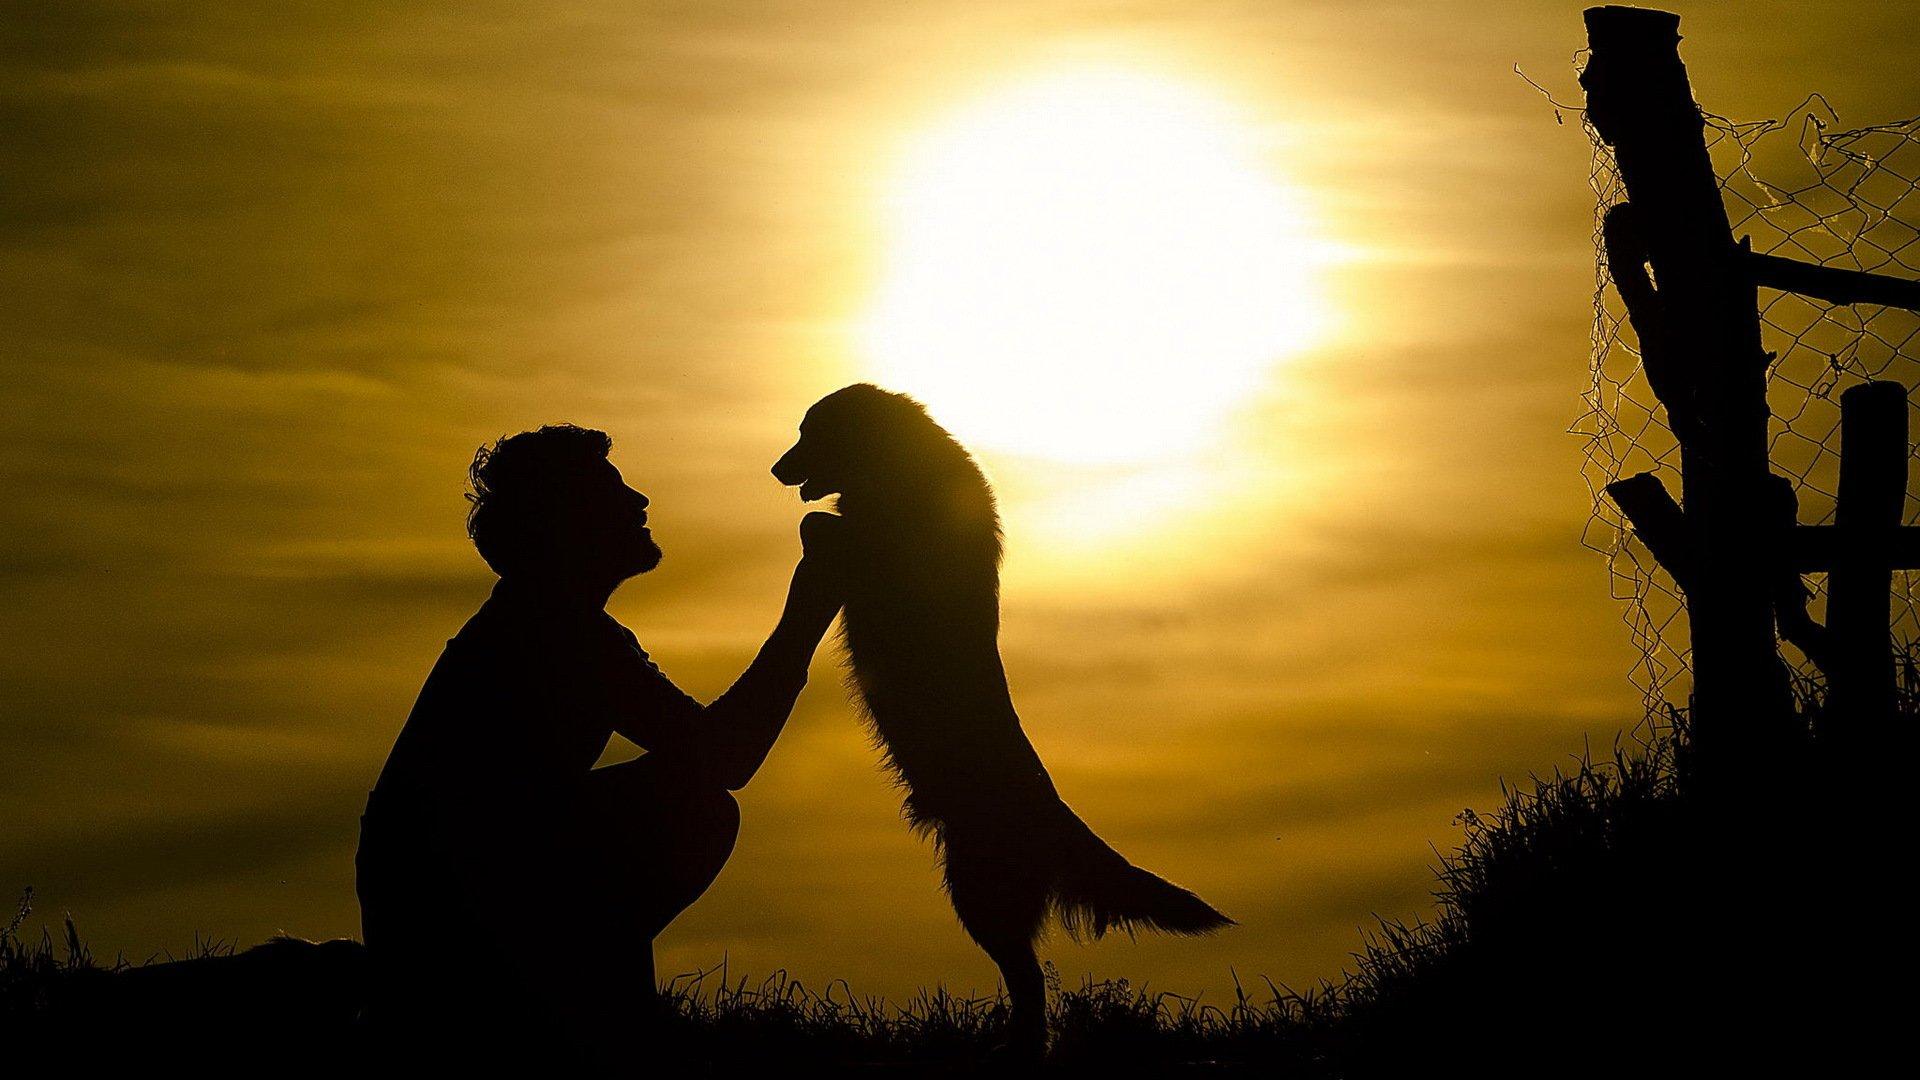 Собака на фоне заката  № 2038716 загрузить